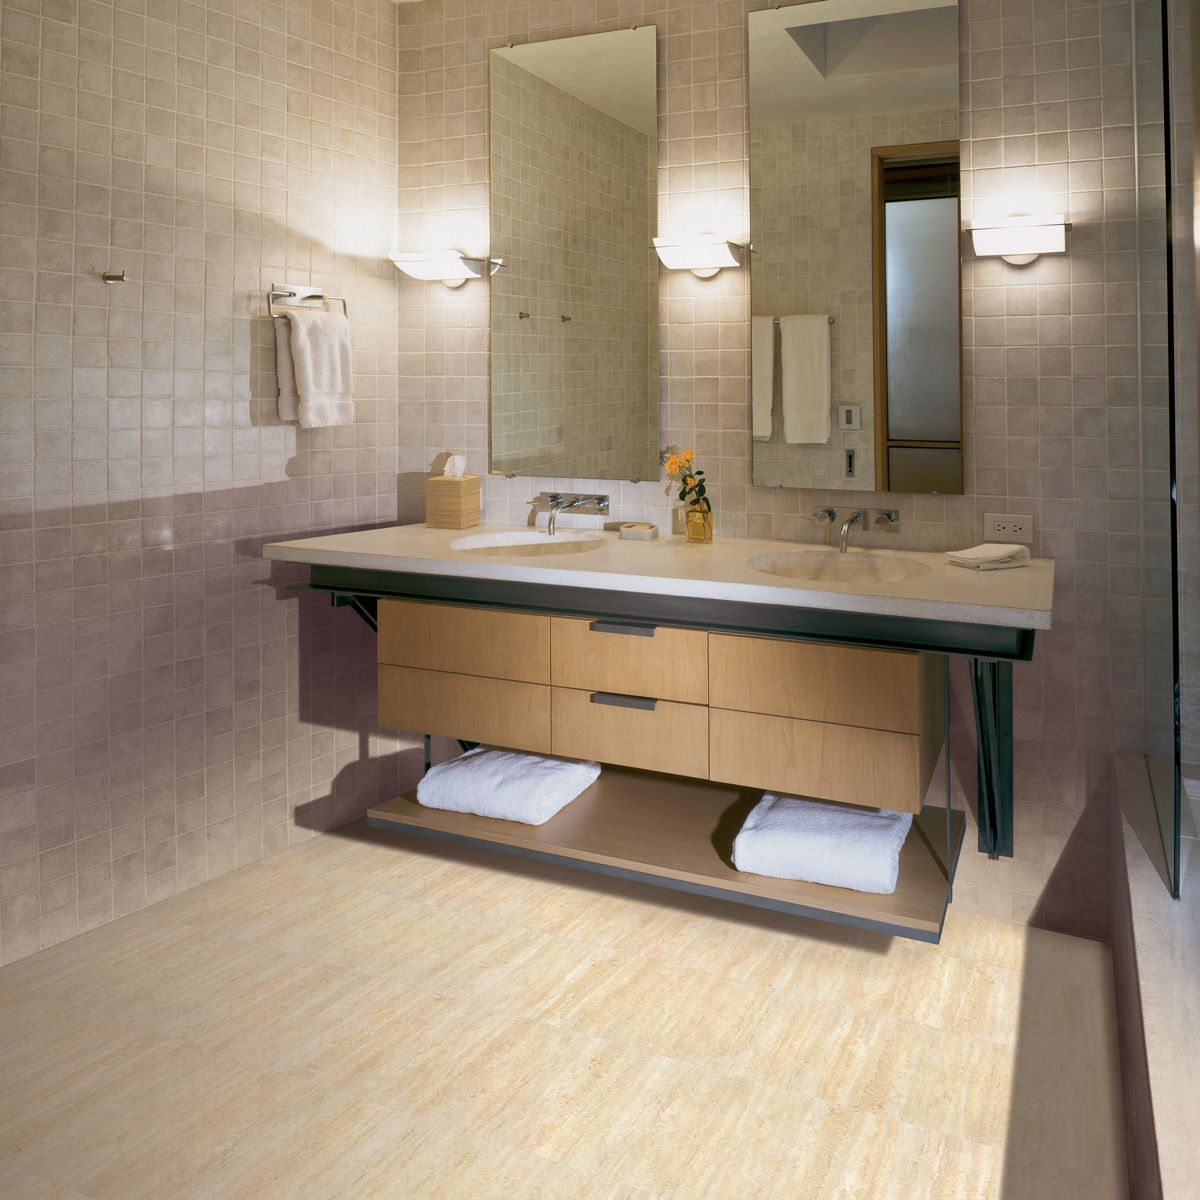 COREtec Tile Ankara Travertiine 50LVT104 Coretec, Luxury